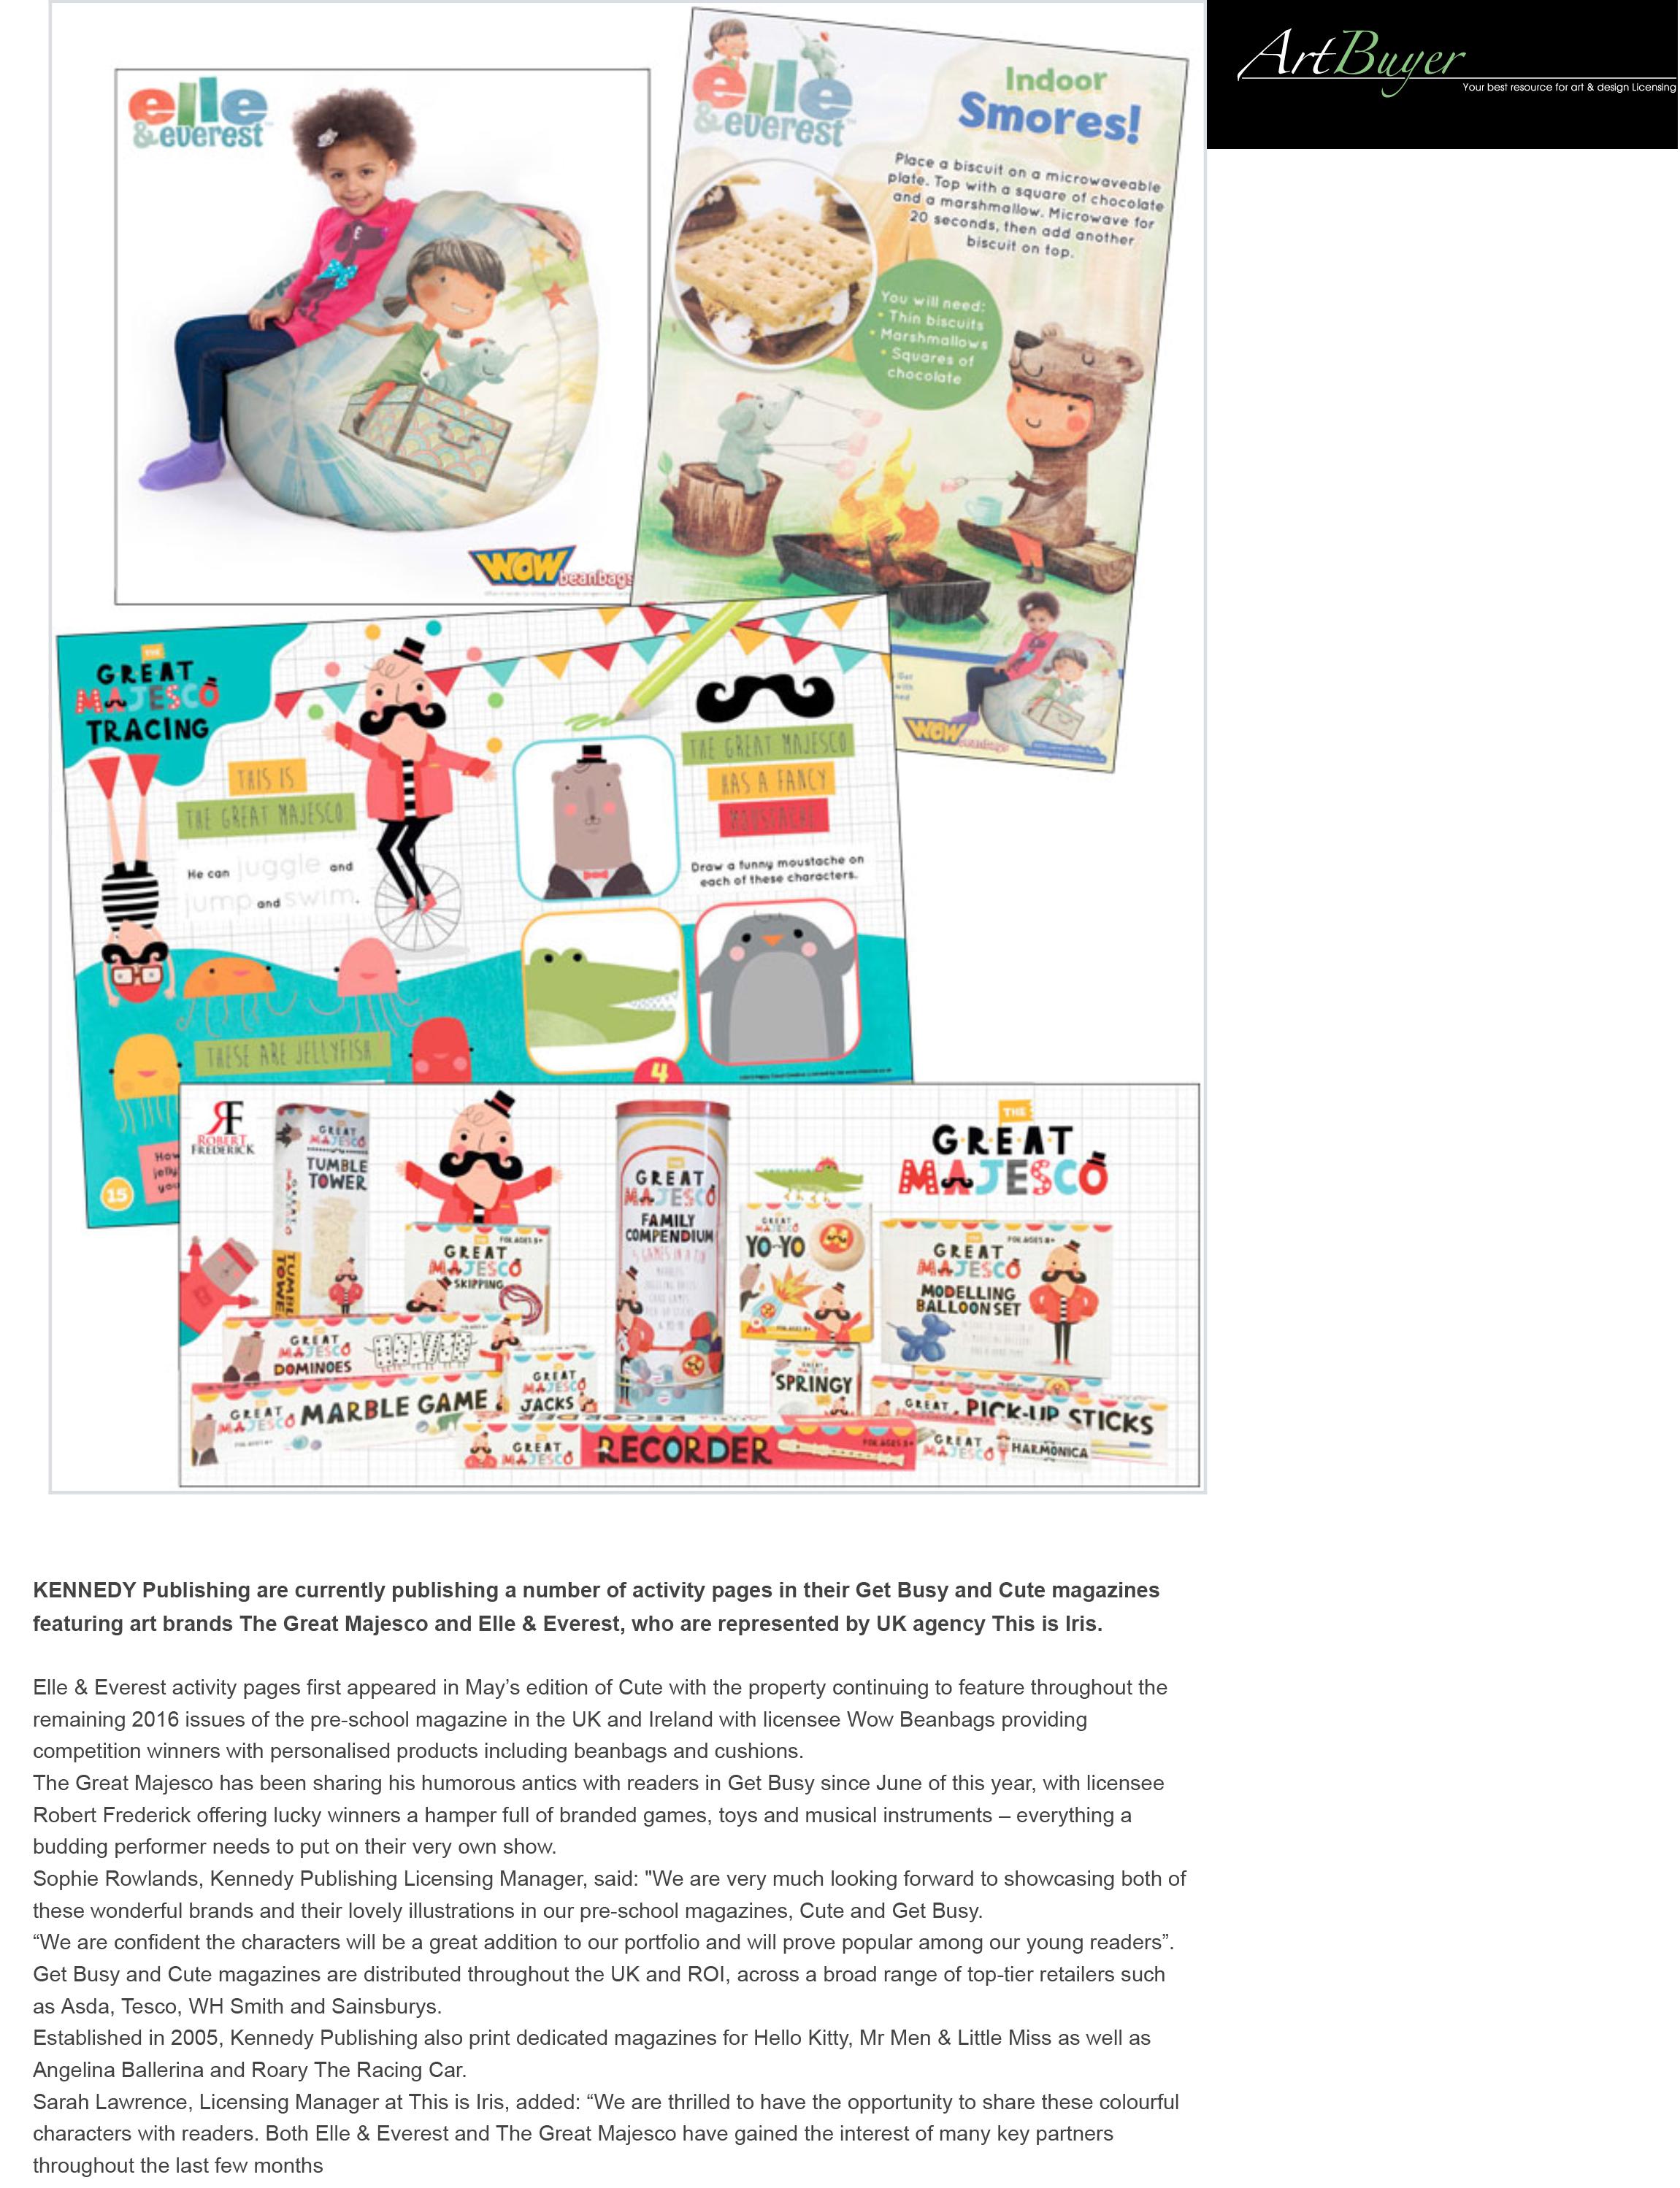 Art-brands-in-print-_-Art-Buyer-Magazine